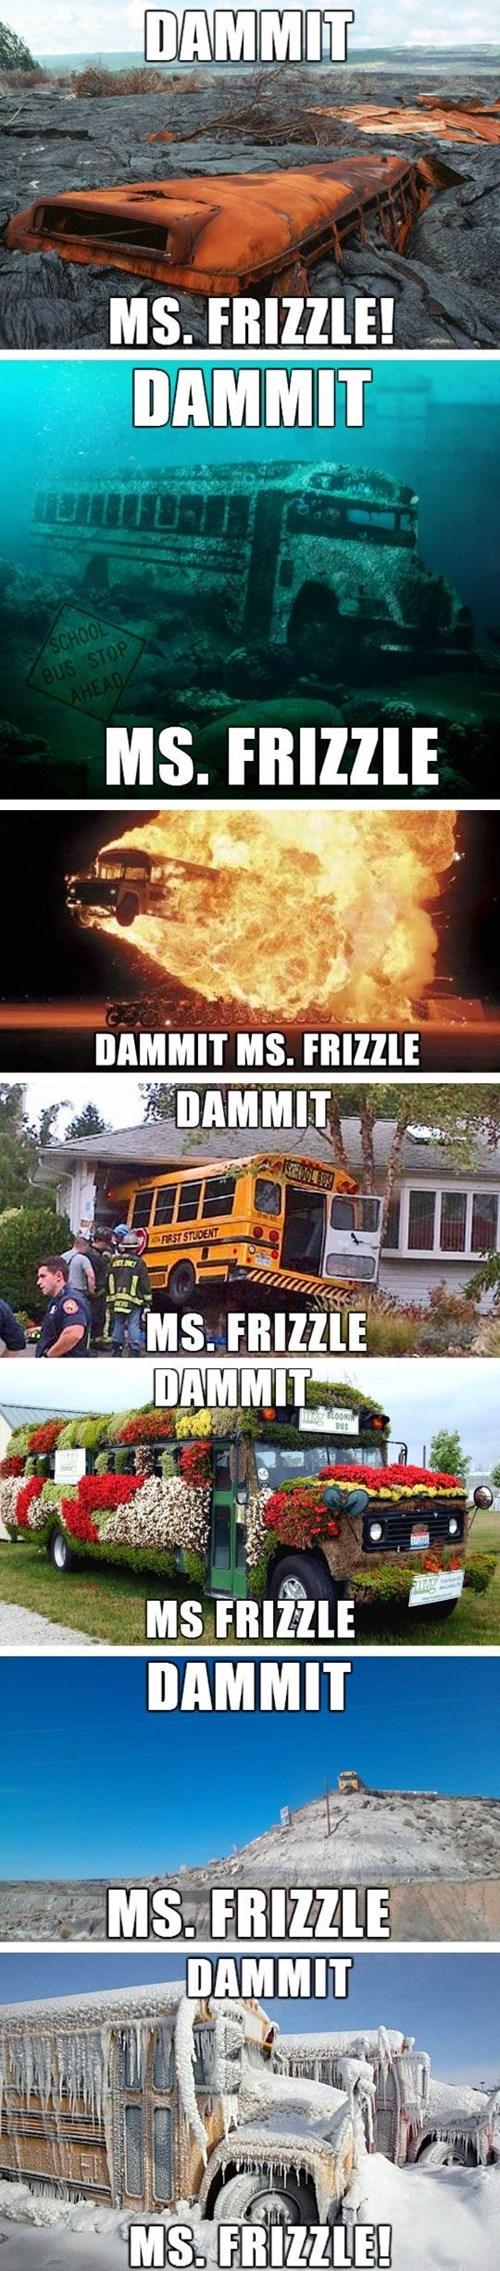 cartoon memes dammit ms frizzle